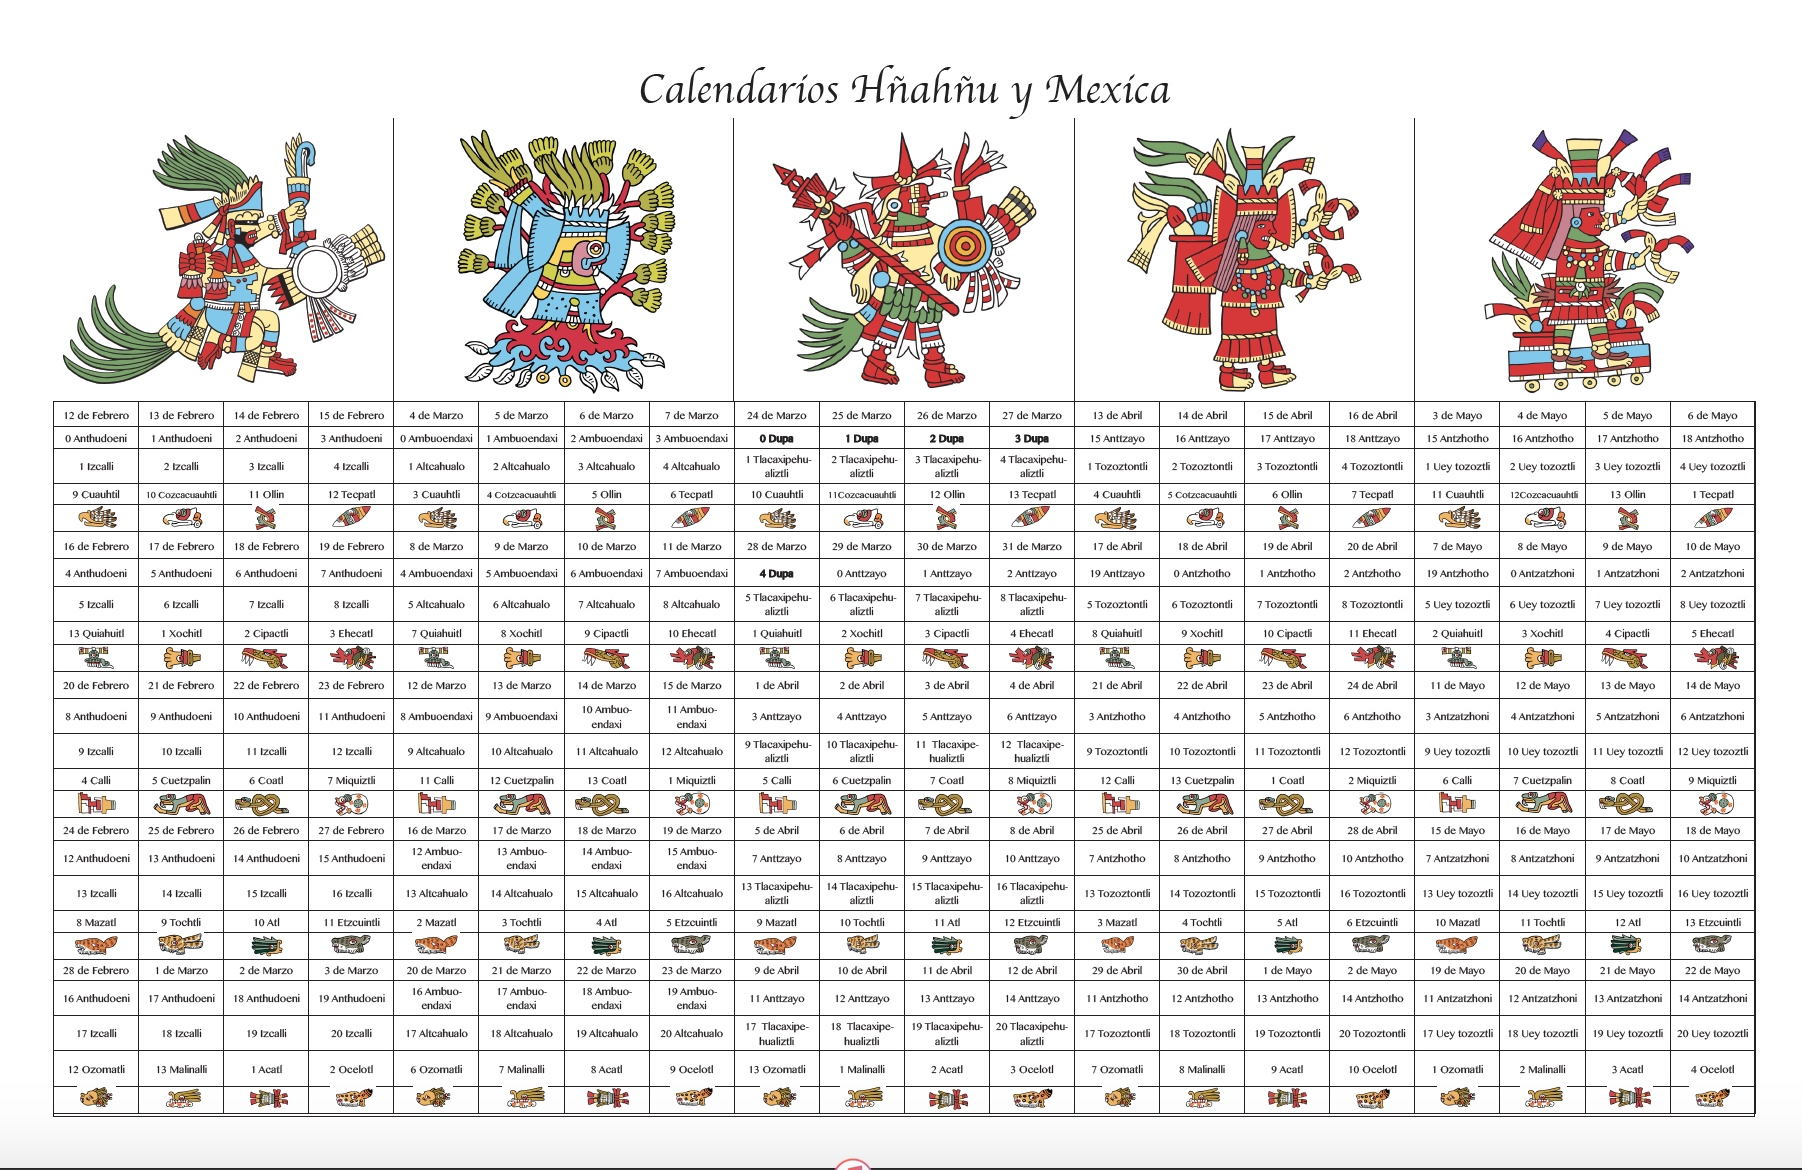 Calendario Hnahnu-Mexica